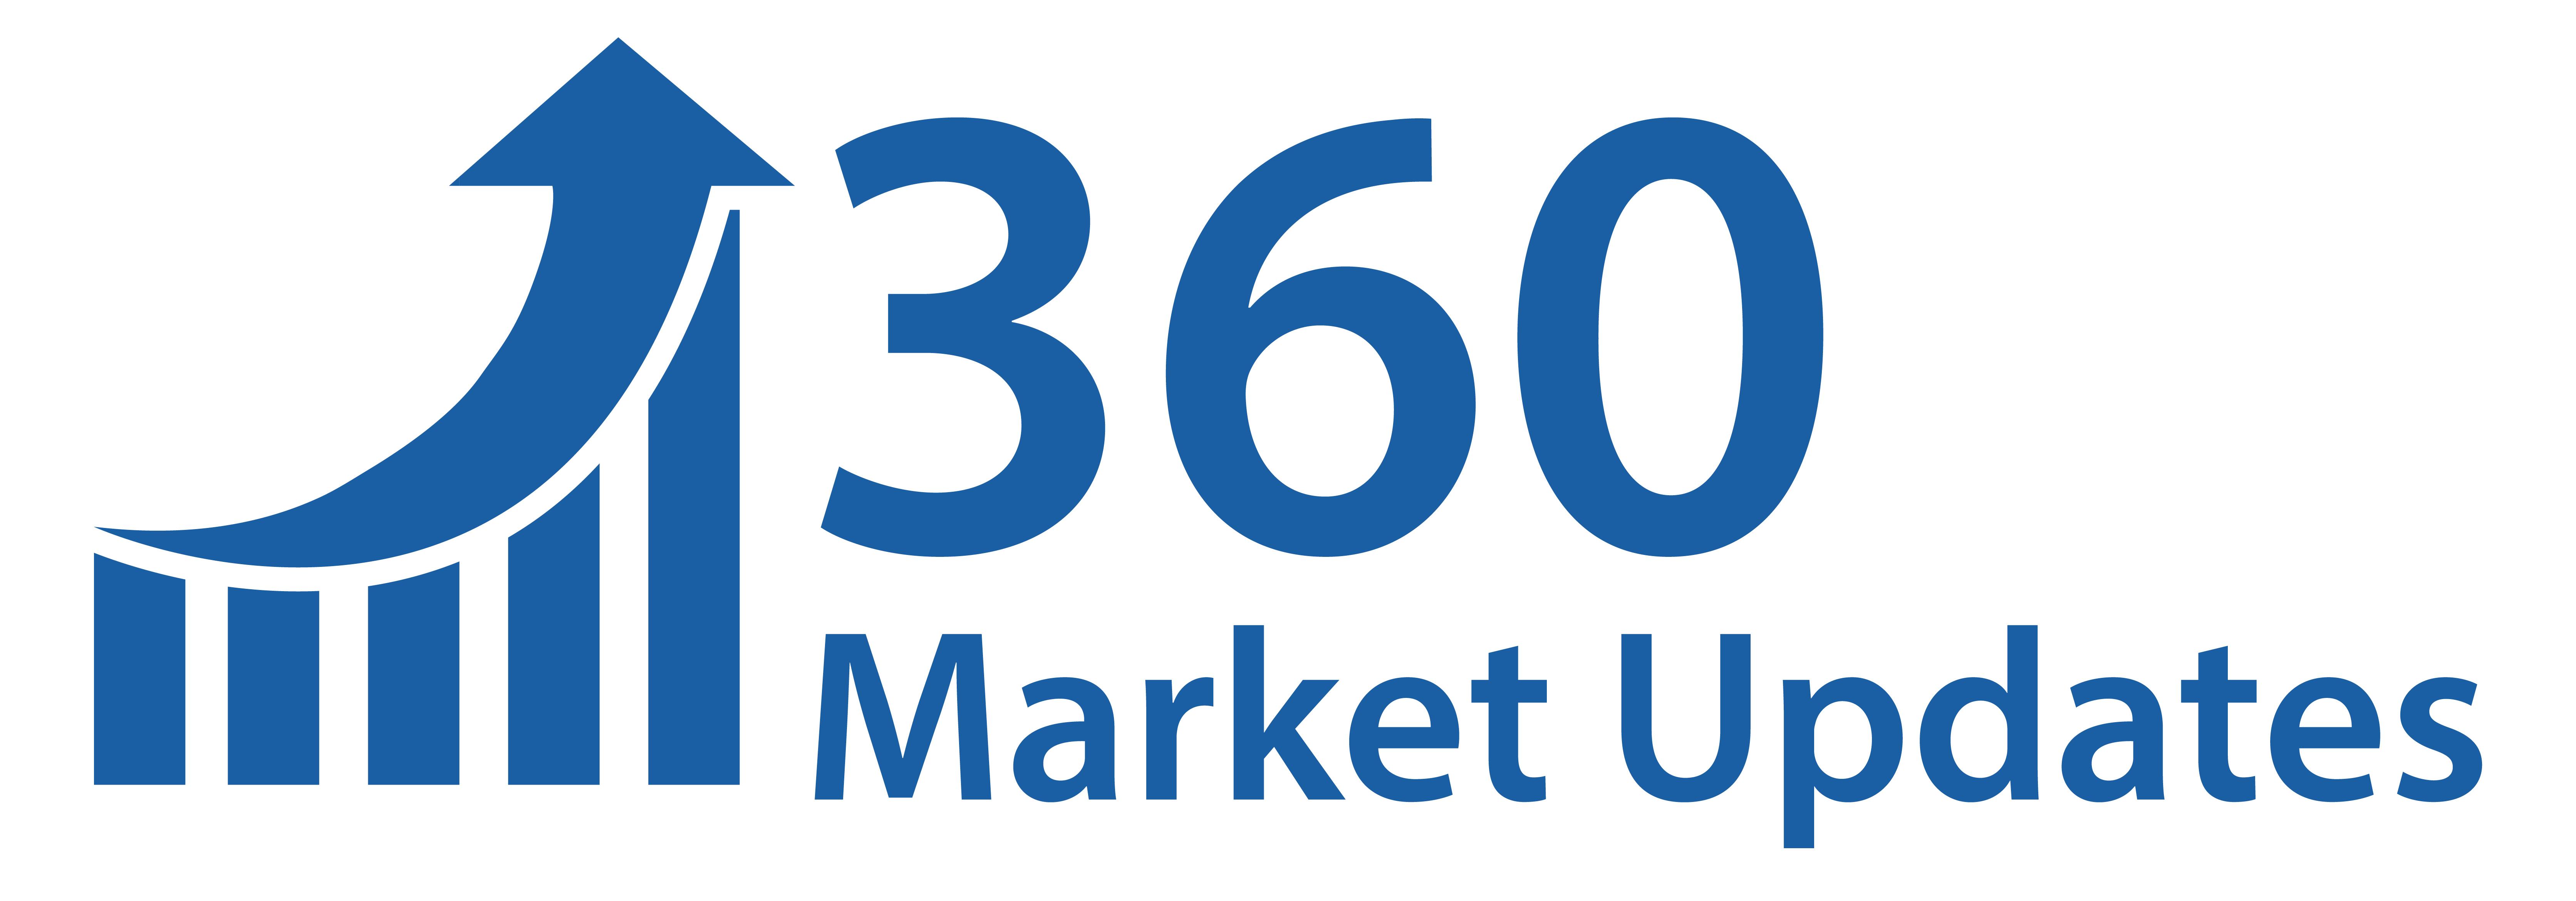 Global Wellhead Connectors Market 2020: Emerging Technologies, Sales Revenue, Key Player Analysis, Development Status, Opportunity Assessment und Key Regions 2025.